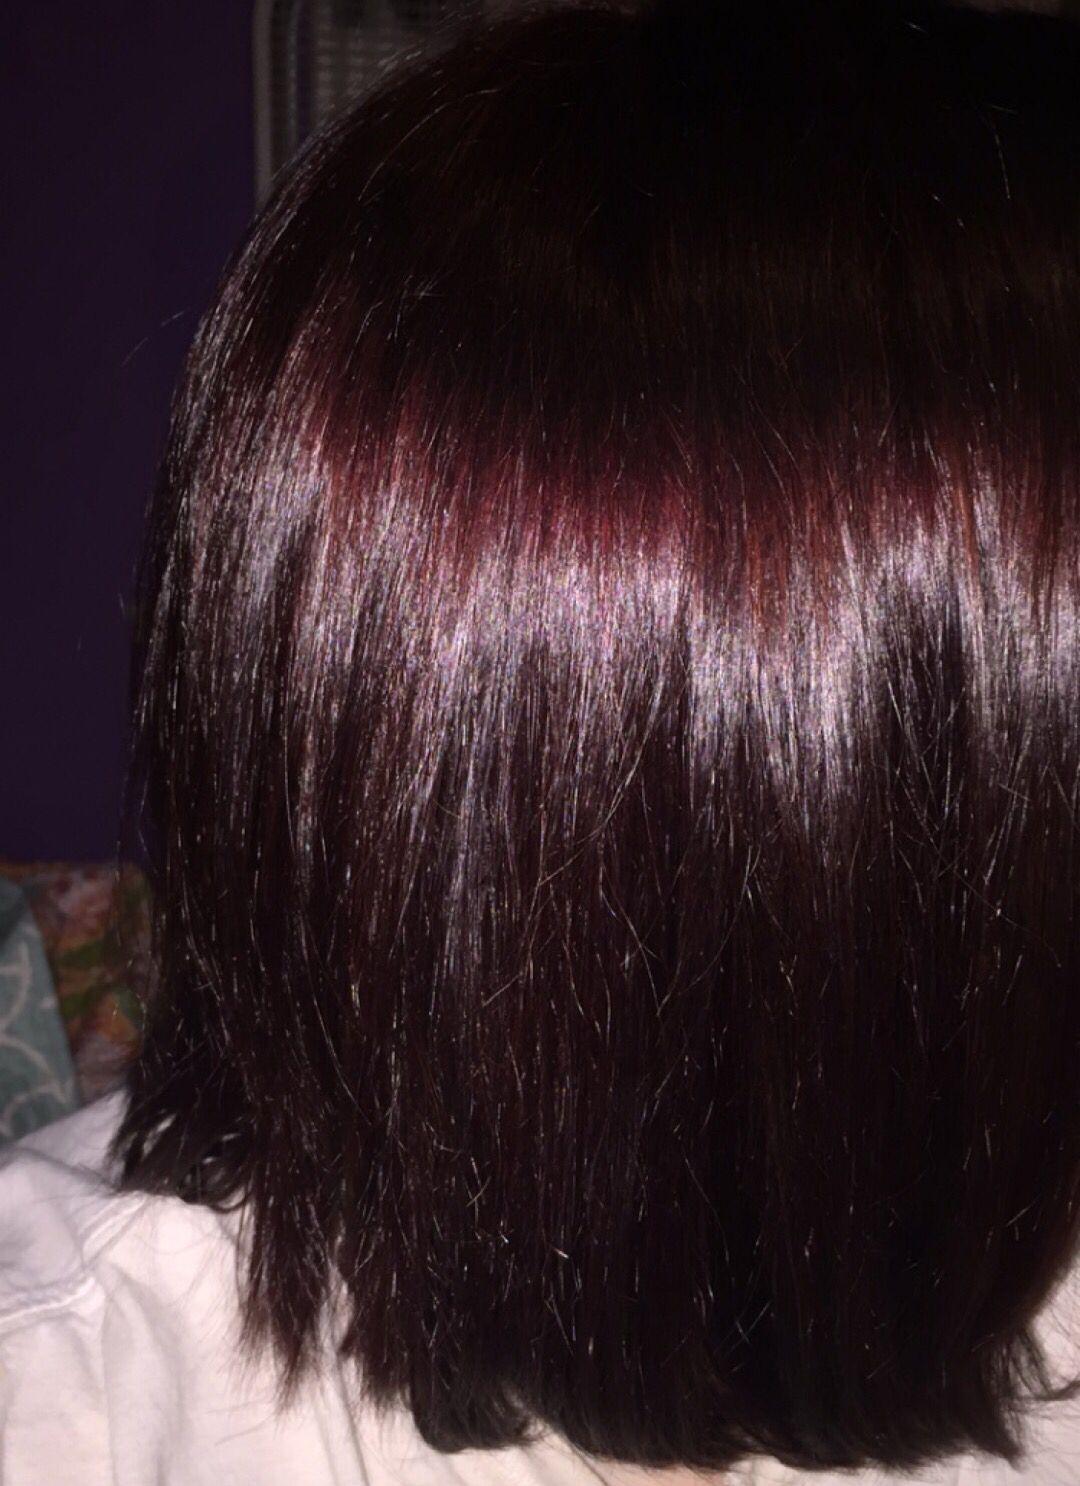 Merlot hair color - Hair Color Ideas L Dark Red Mixed With A Dark Merlot